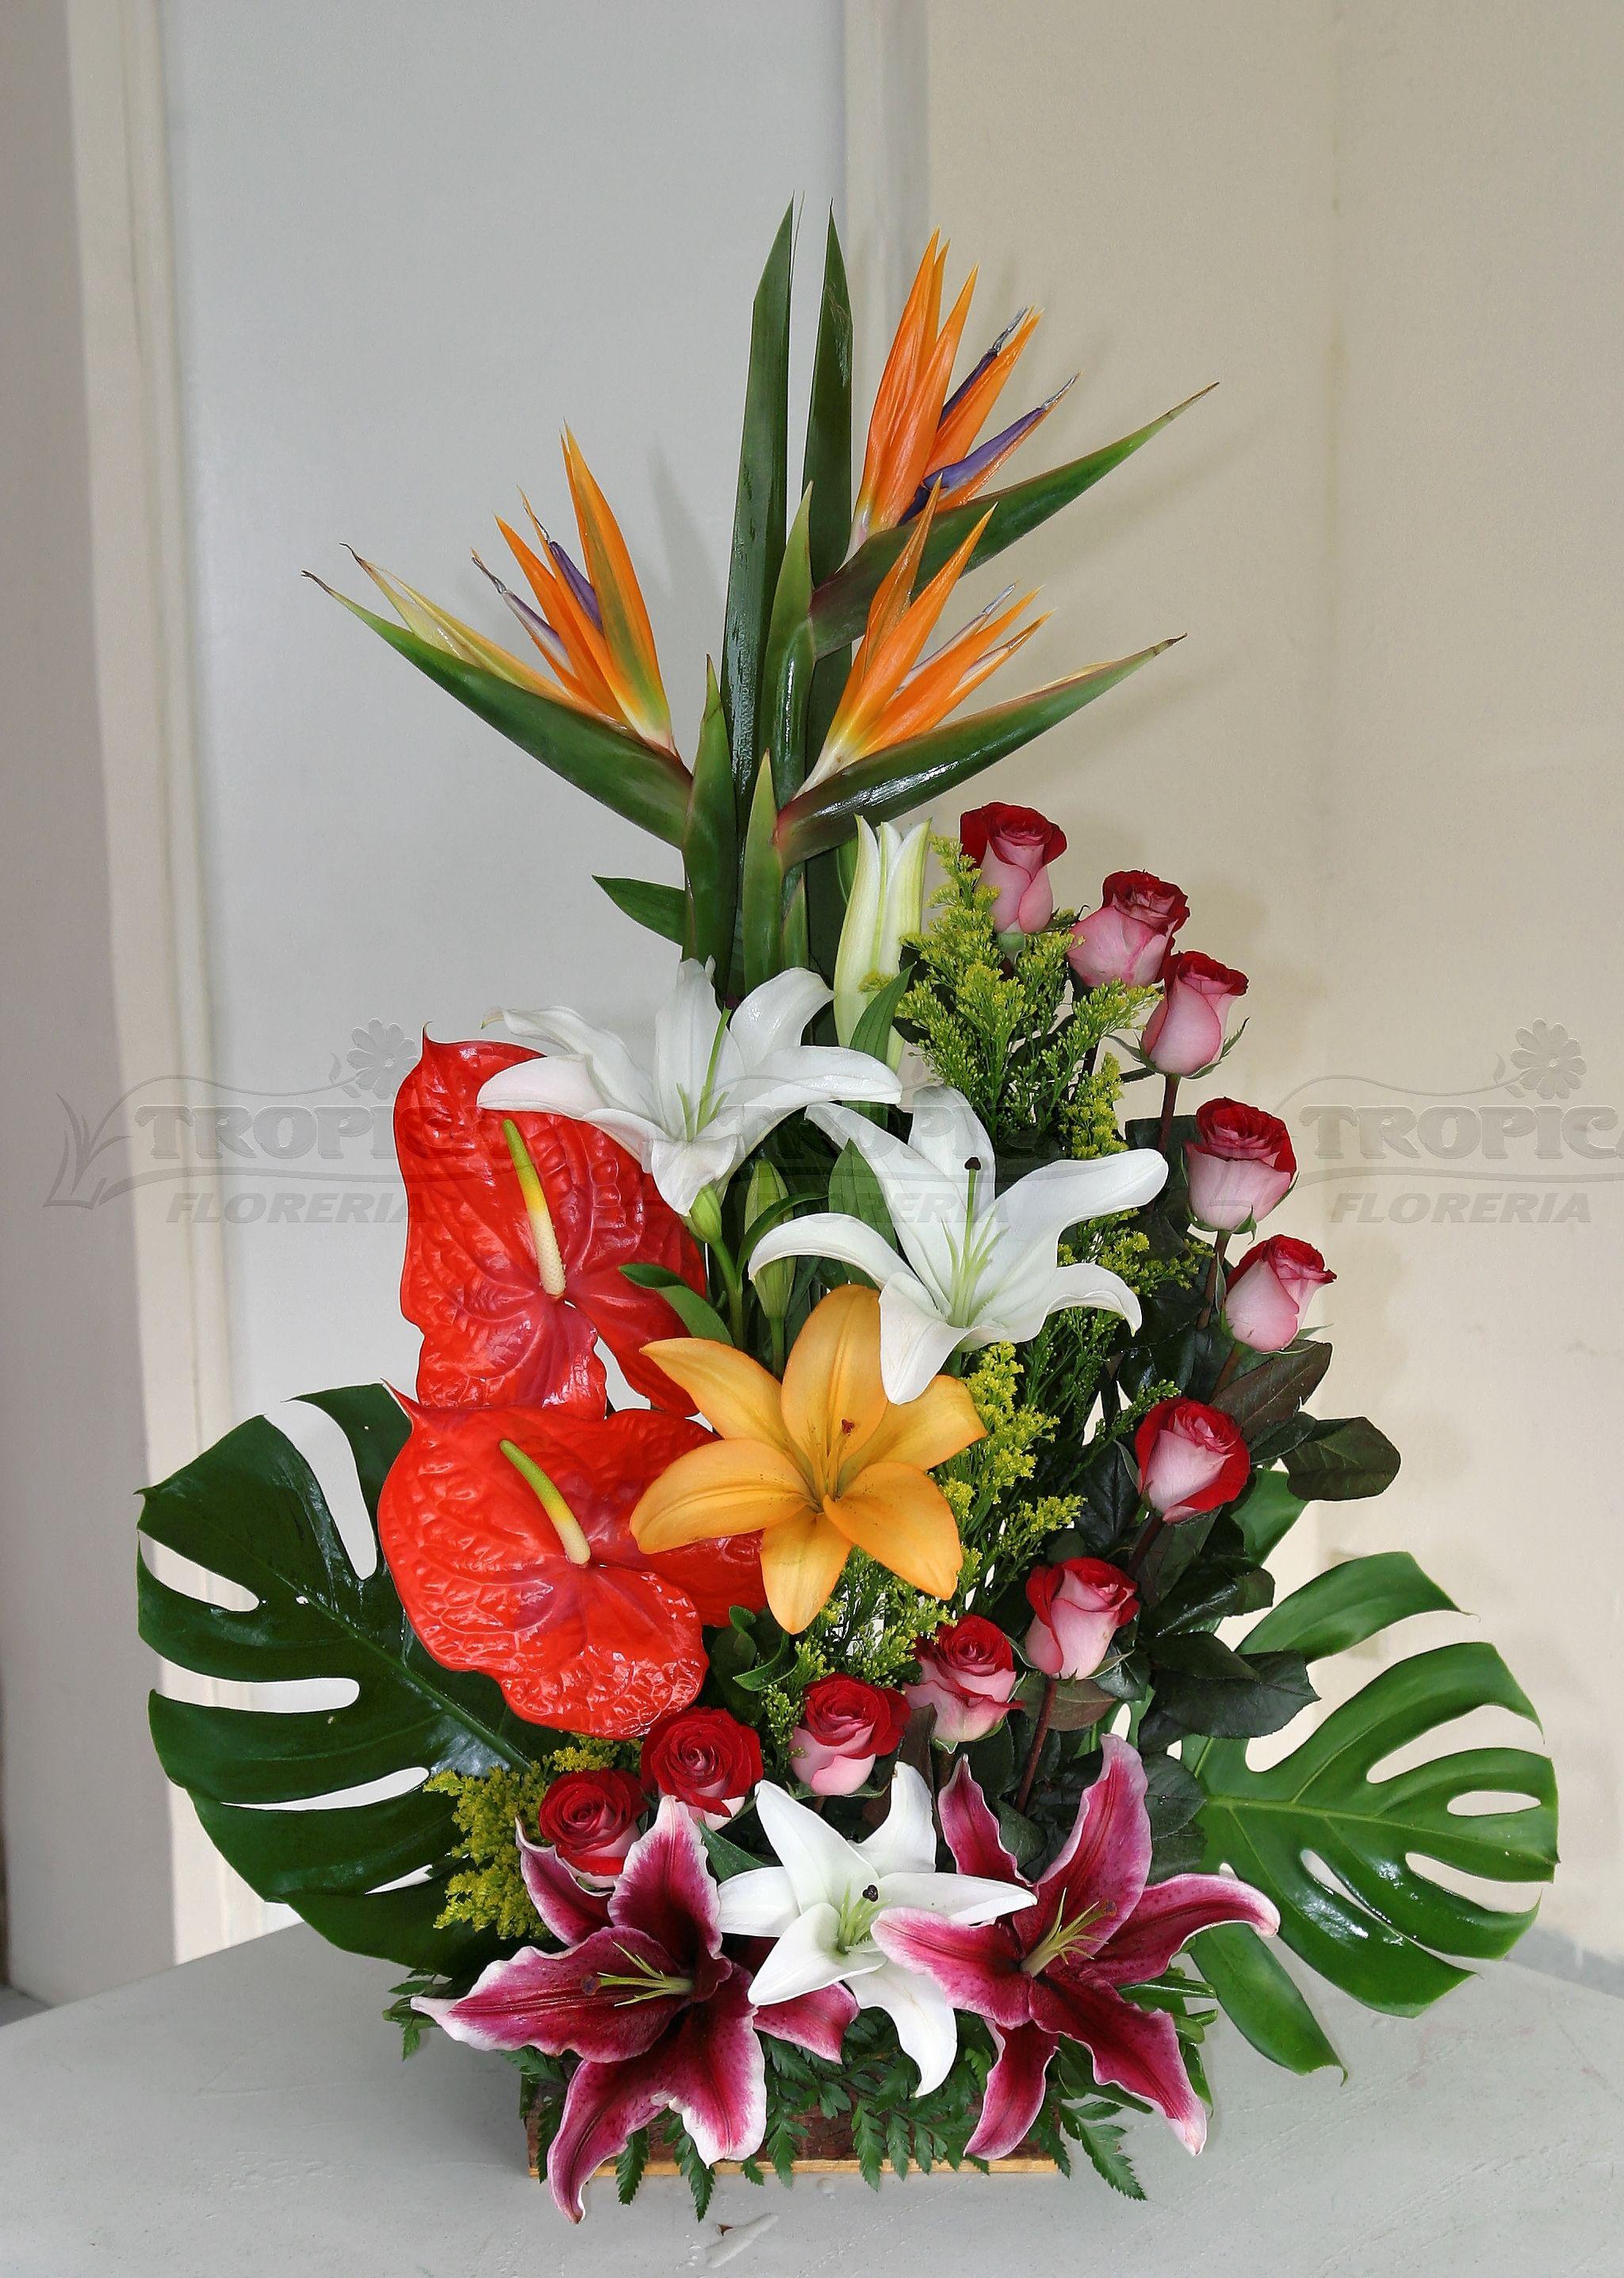 Arreglo tropical tropica floreria arreglos florales Floral creations